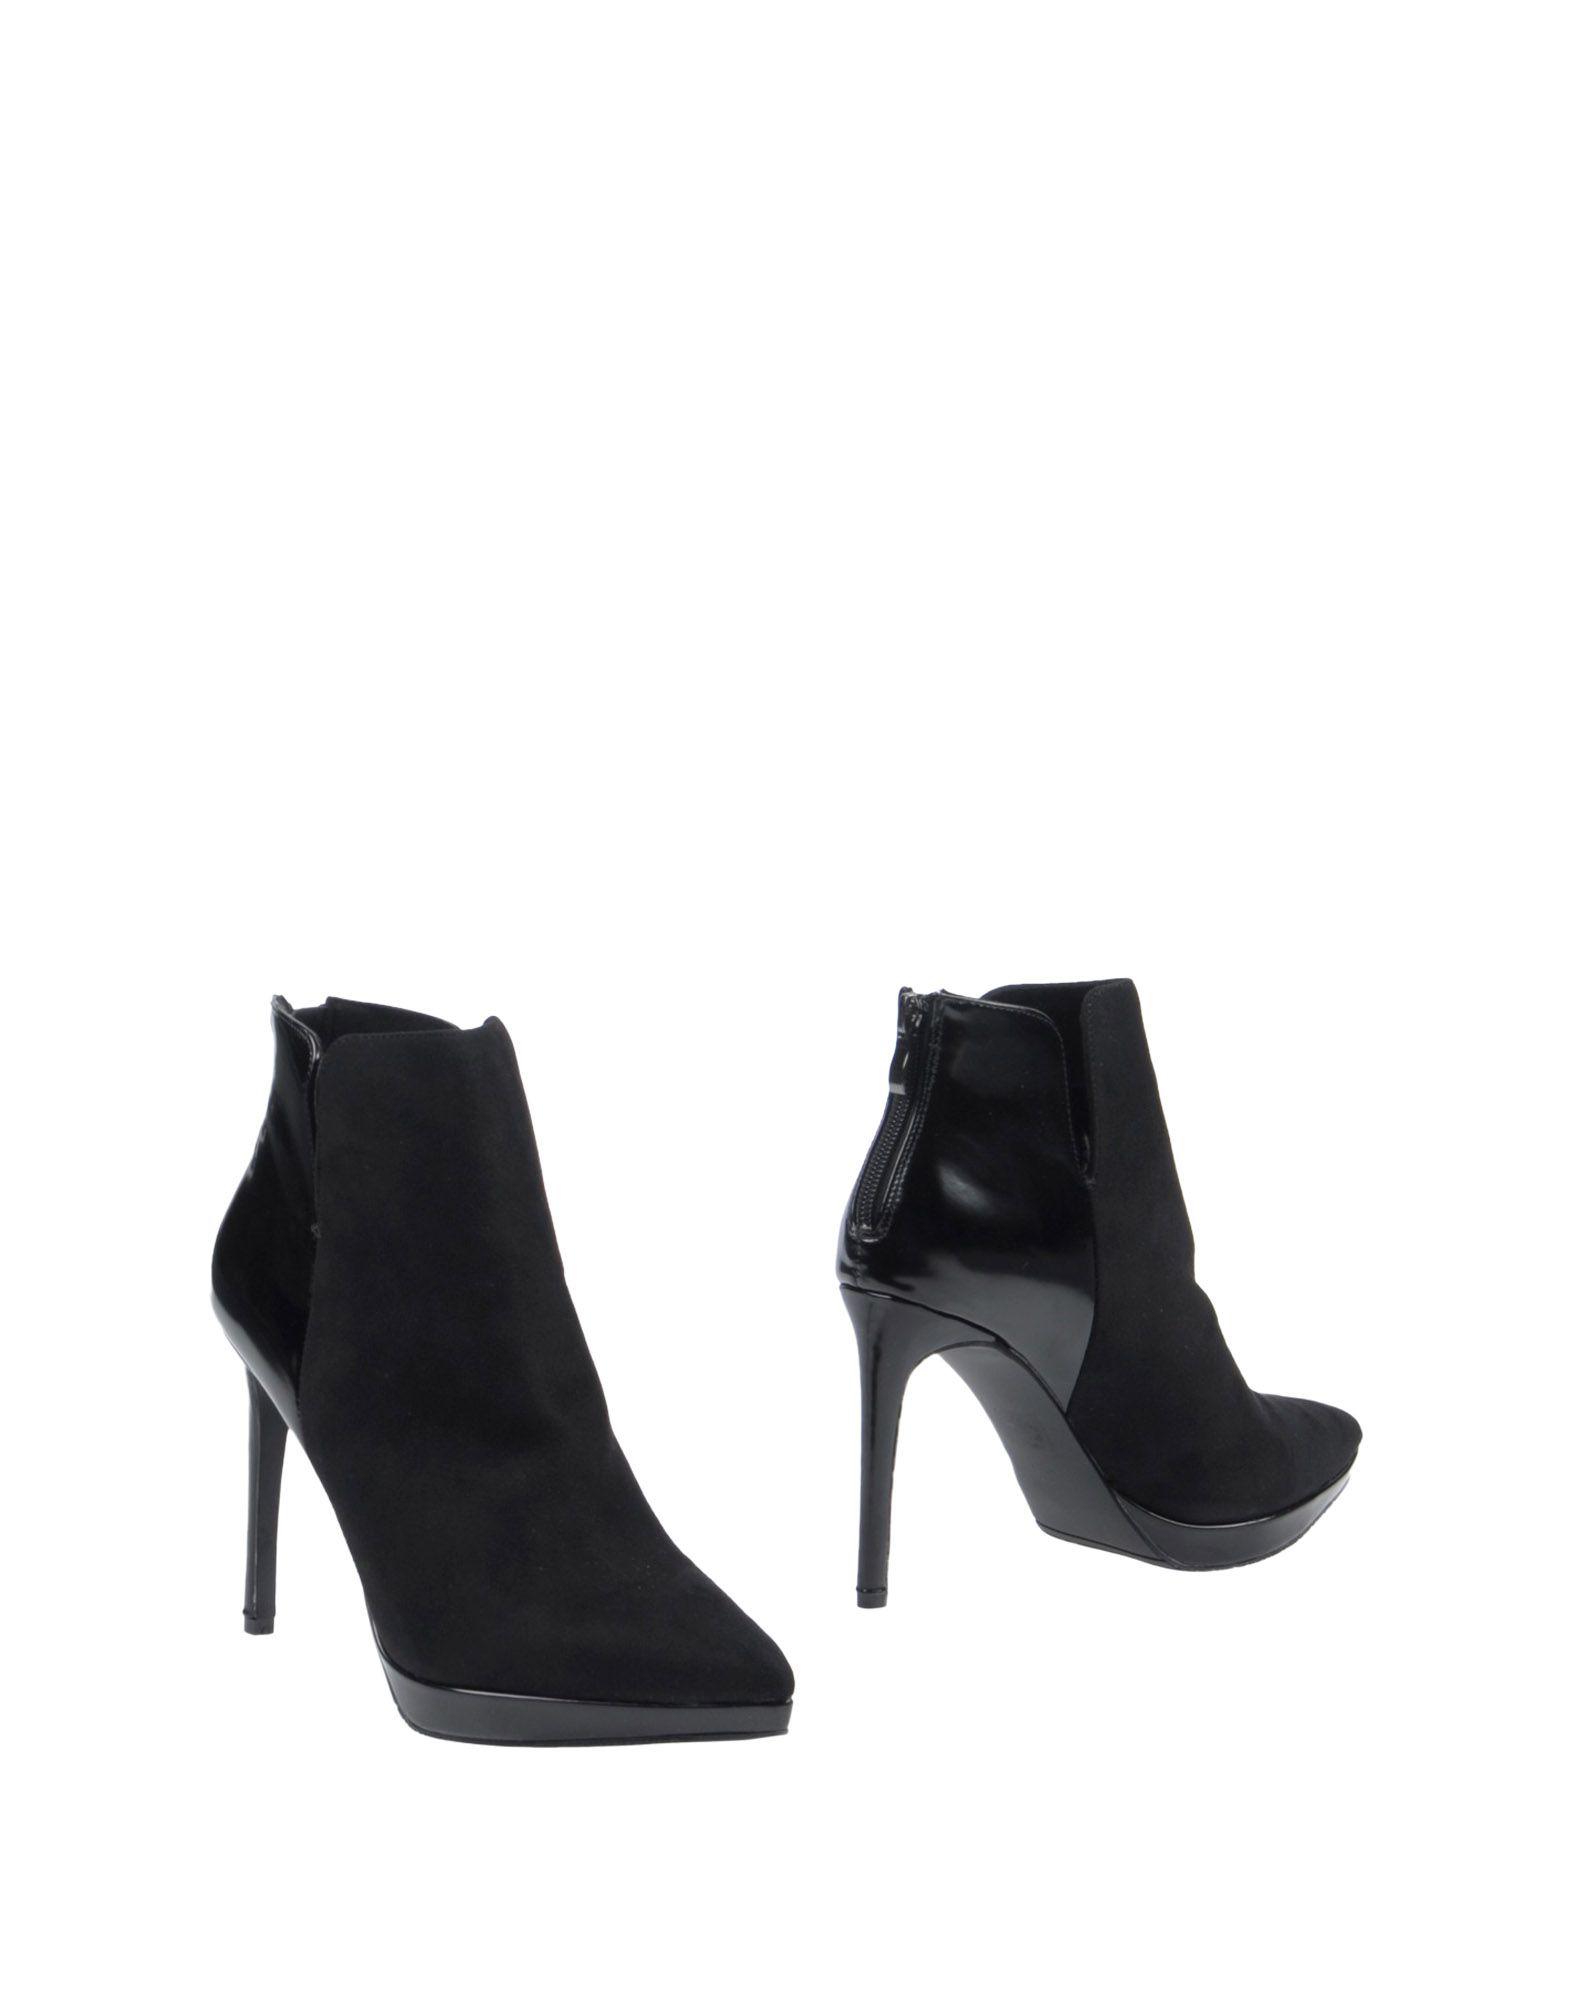 Francesco Milano Stiefelette Damen  11446426CE Gute Qualität beliebte Schuhe